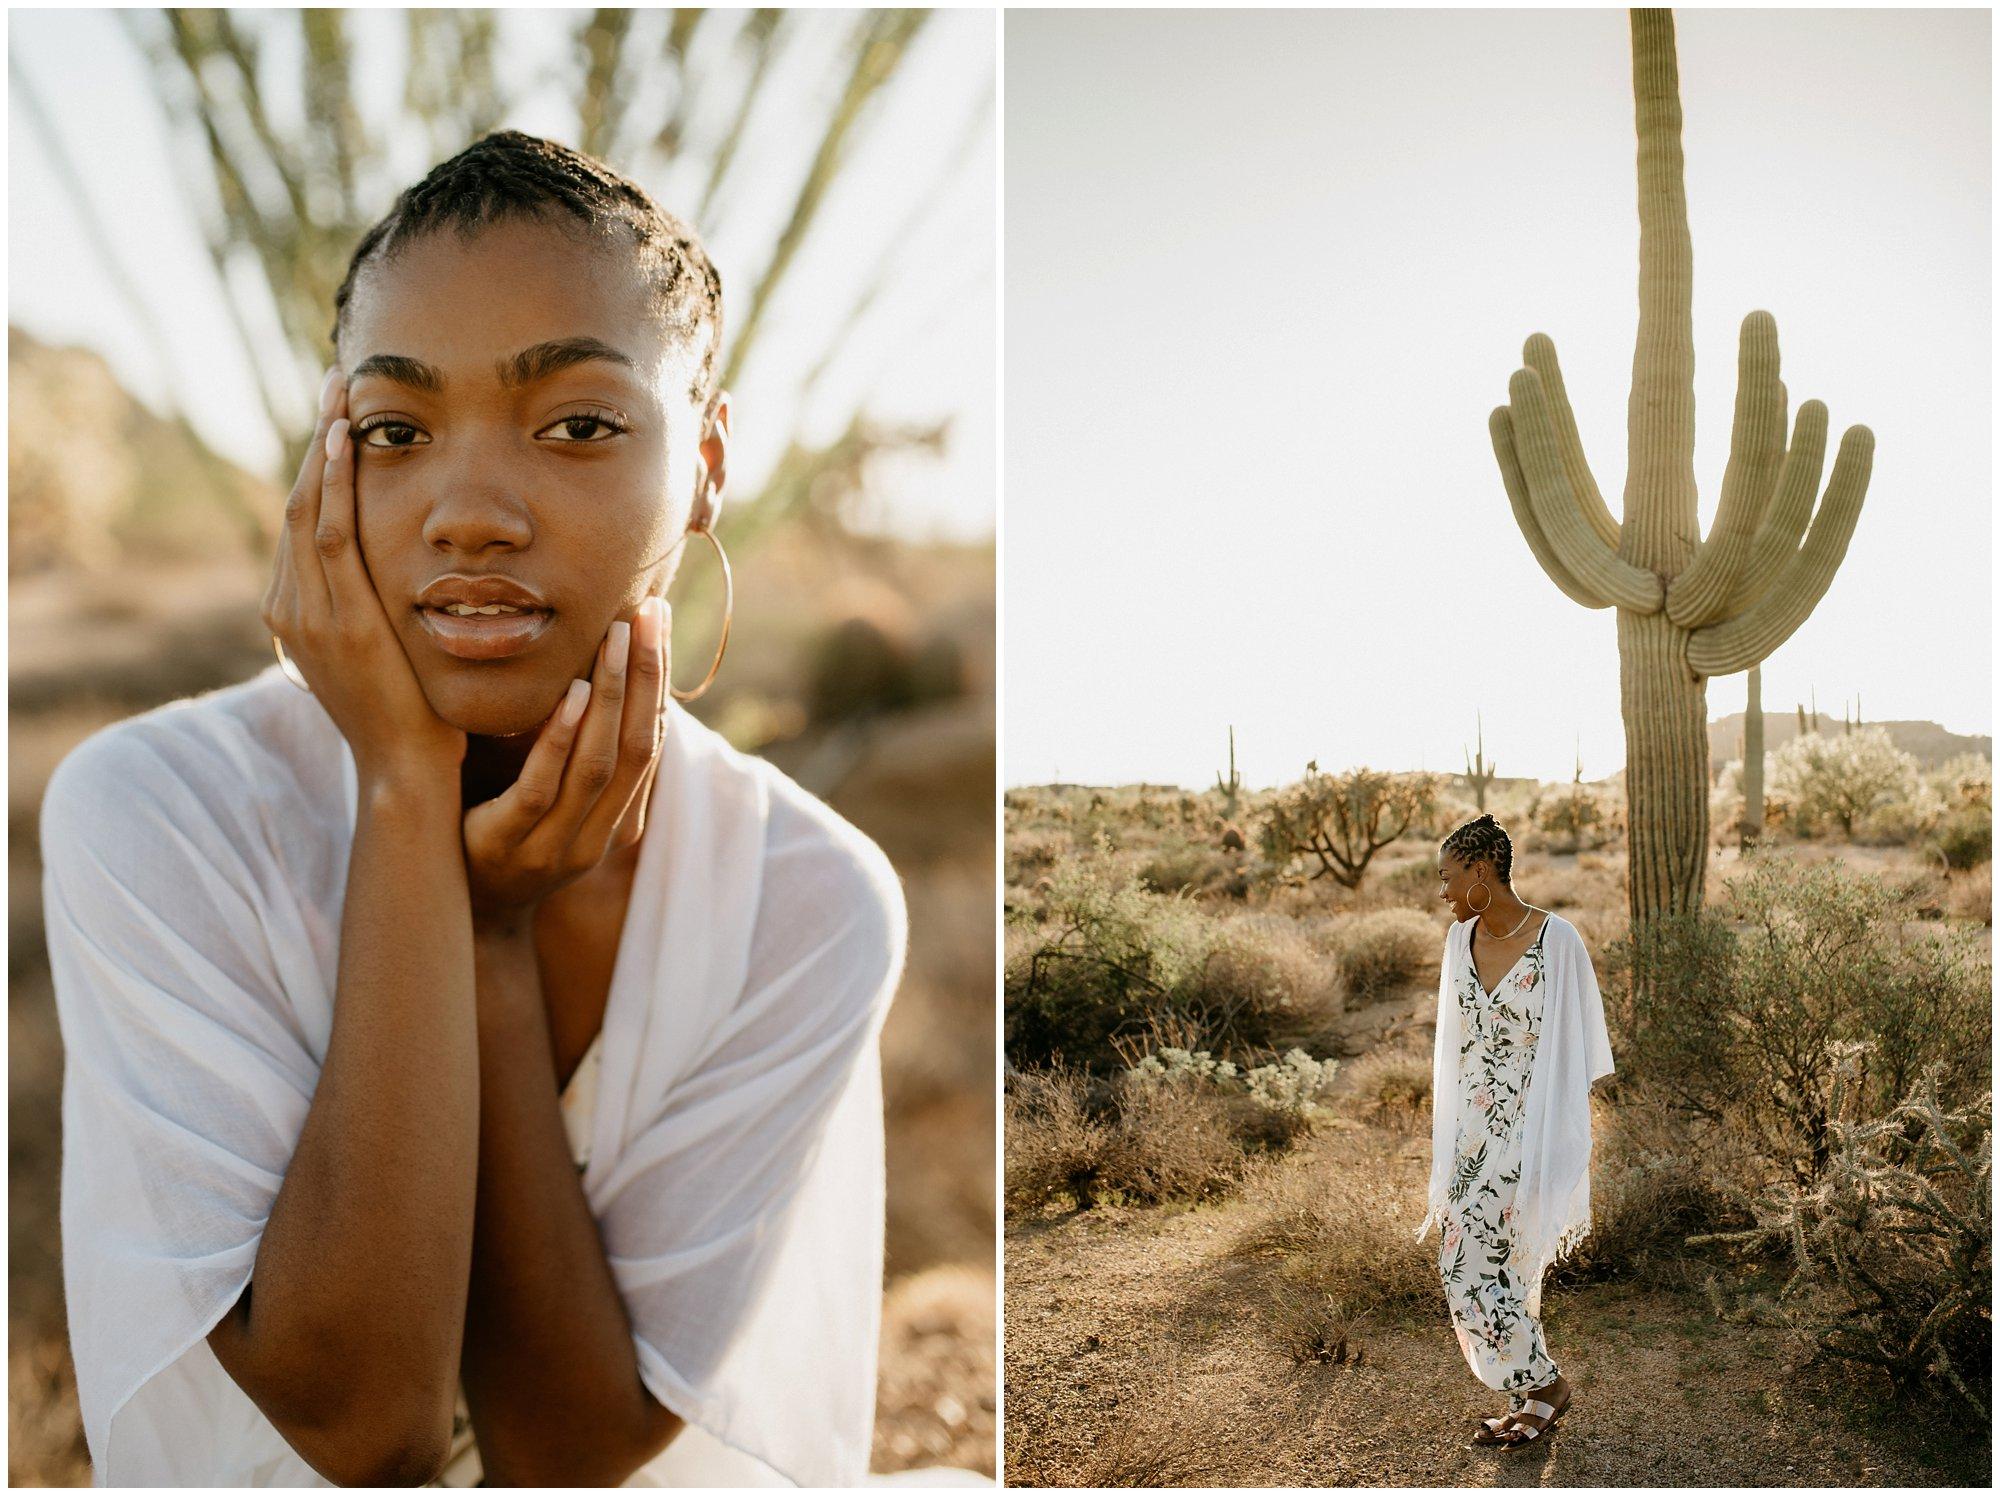 Desert Model Portrait Session - Ashtyn Nicole Photo_0013.jpg